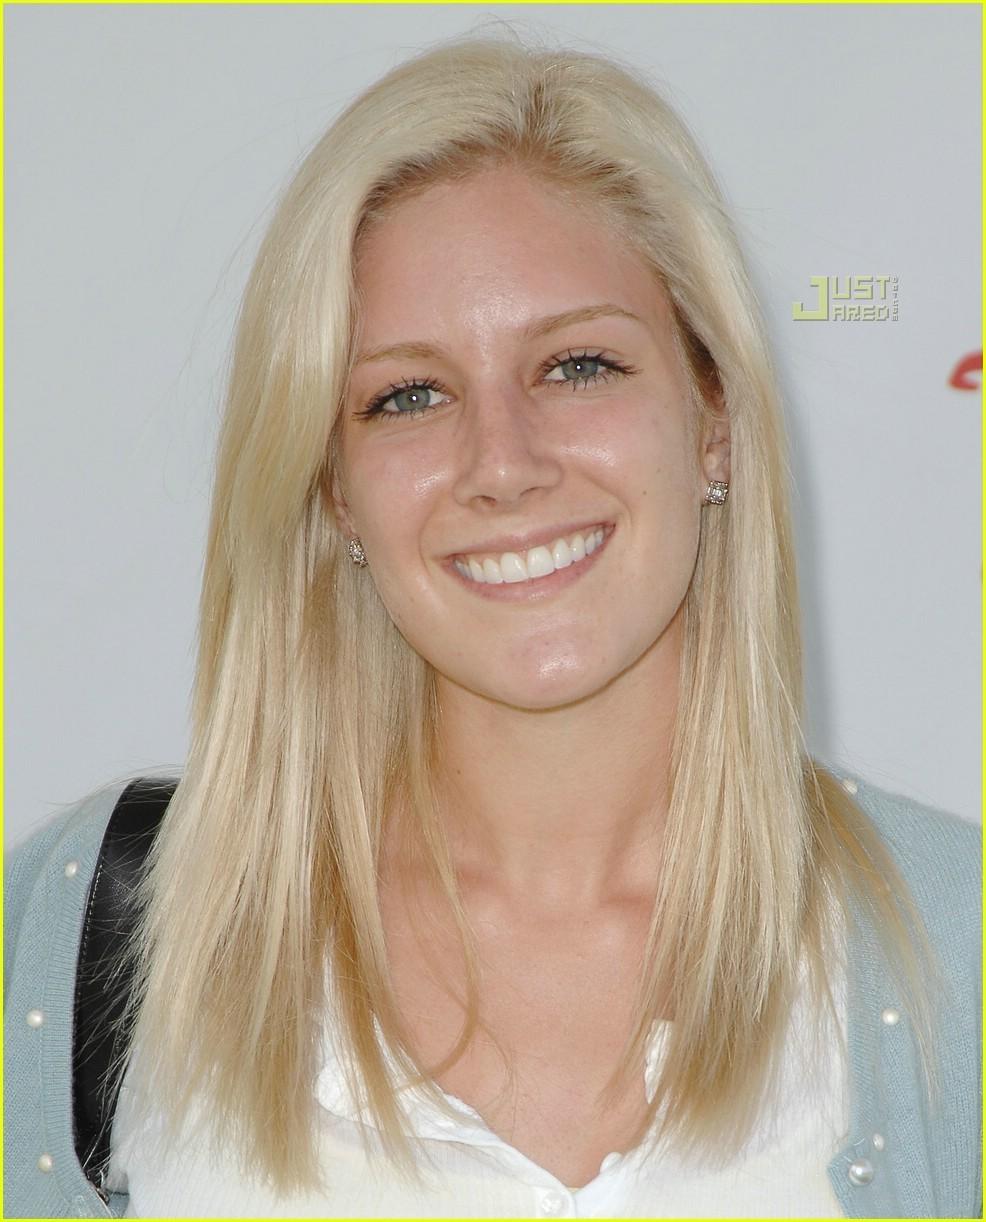 Heidi Montag - Picture